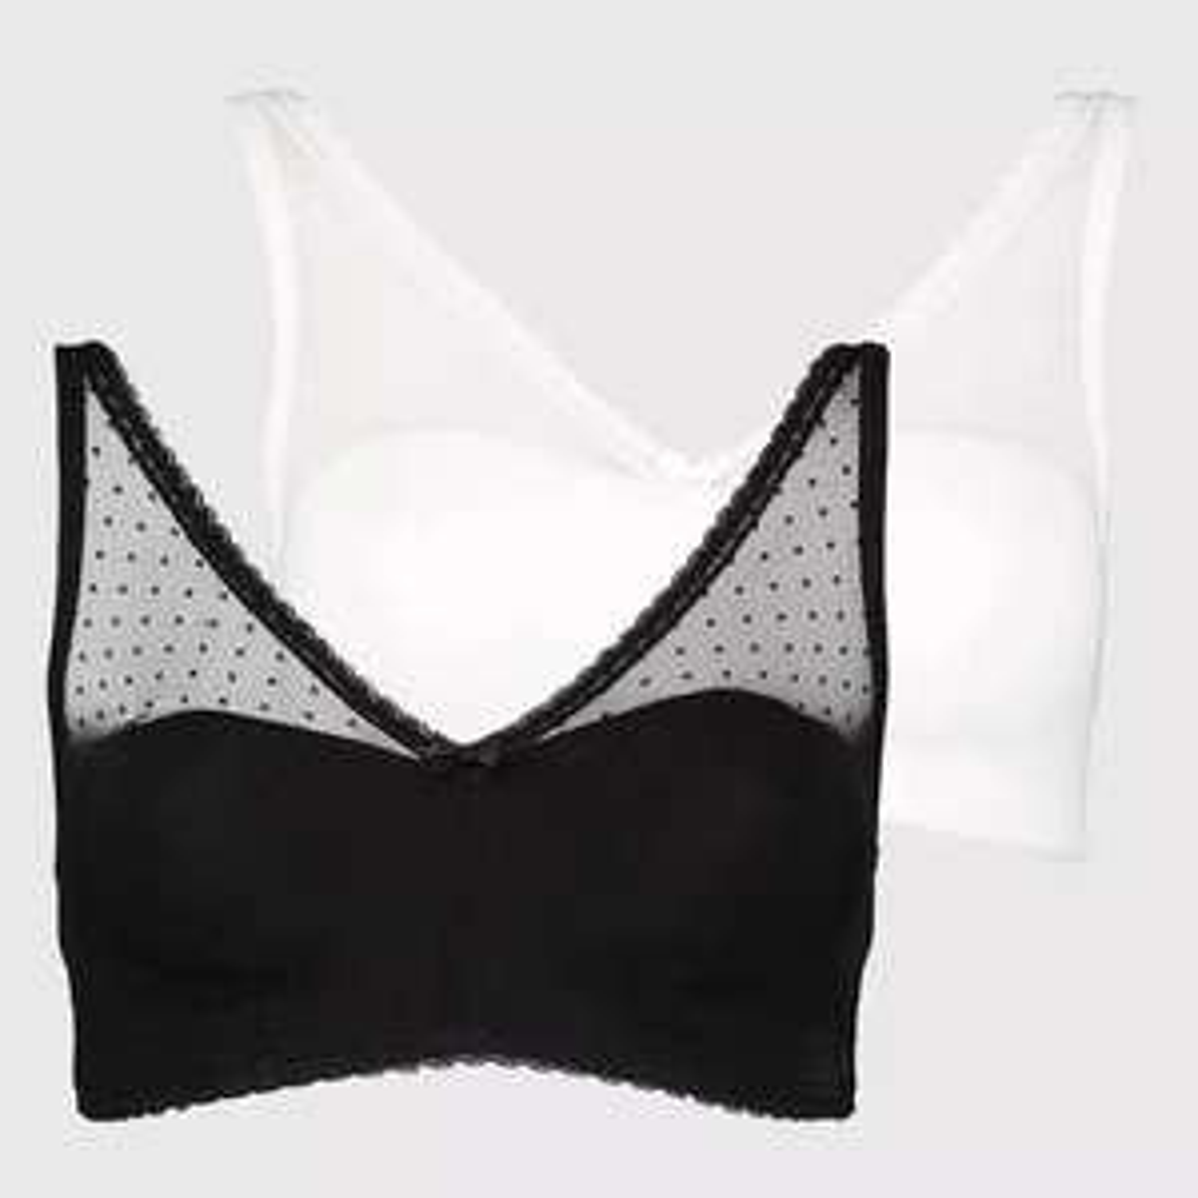 White & Black Spot Mesh Padded Lounge Bra - 2 Pack for £7.00 @ Argos (click & collect)